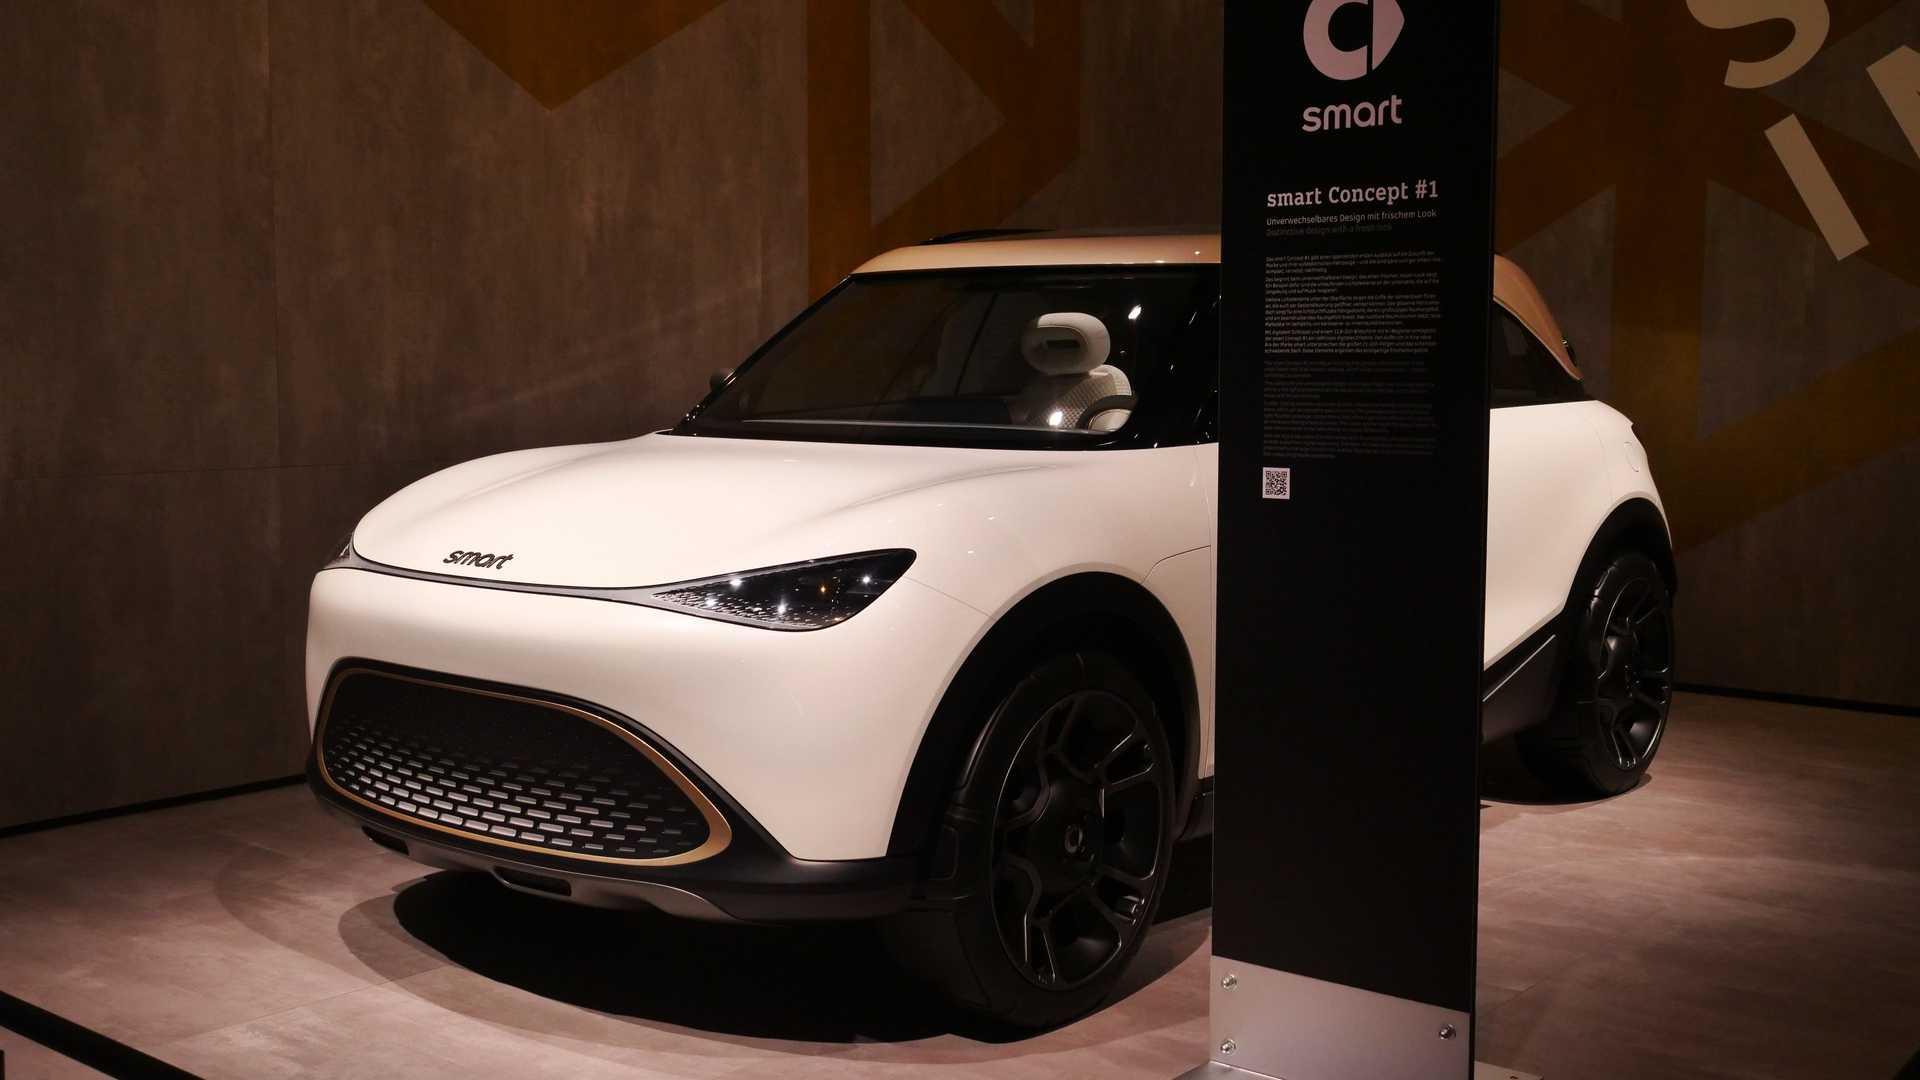 white car Smart Concept #1 image